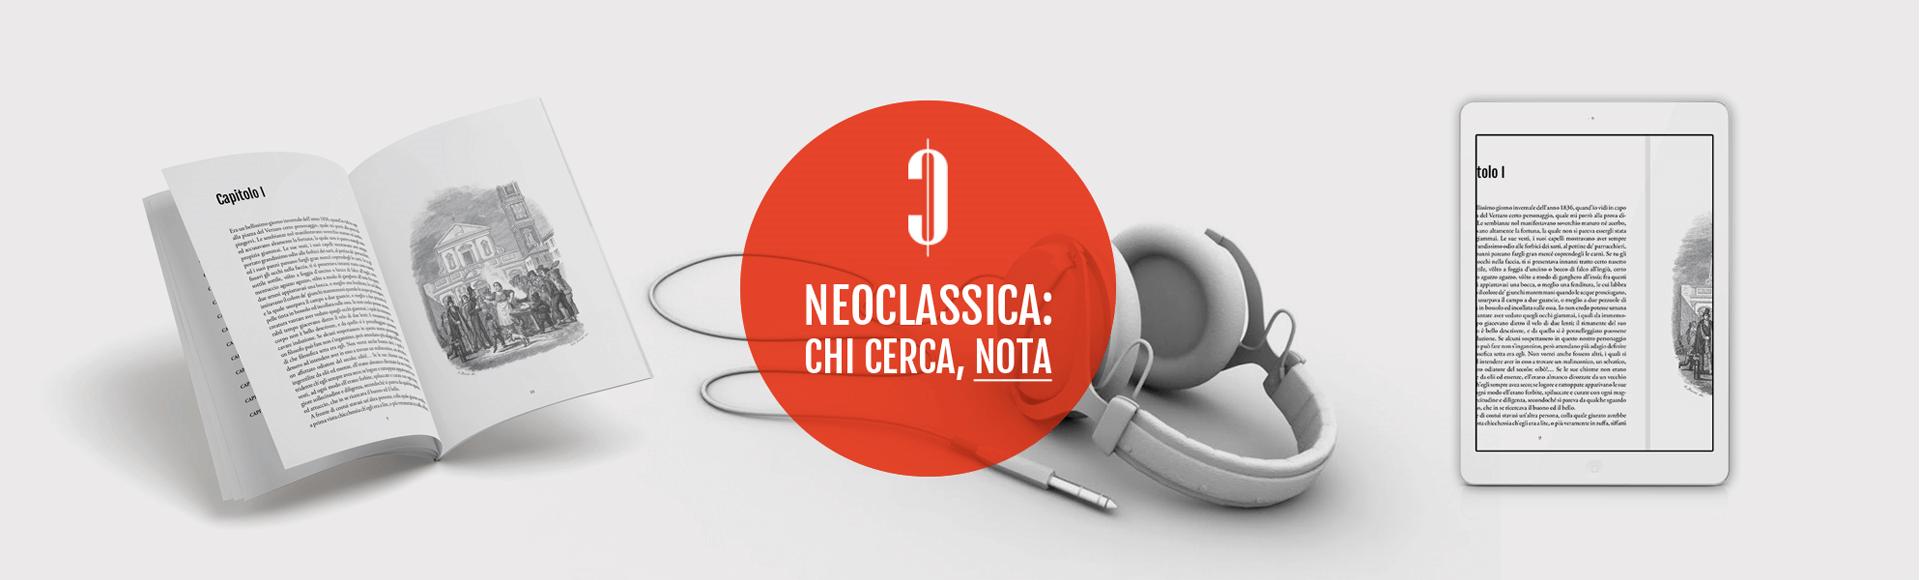 imm_1796_neoclassica-copertina.jpg